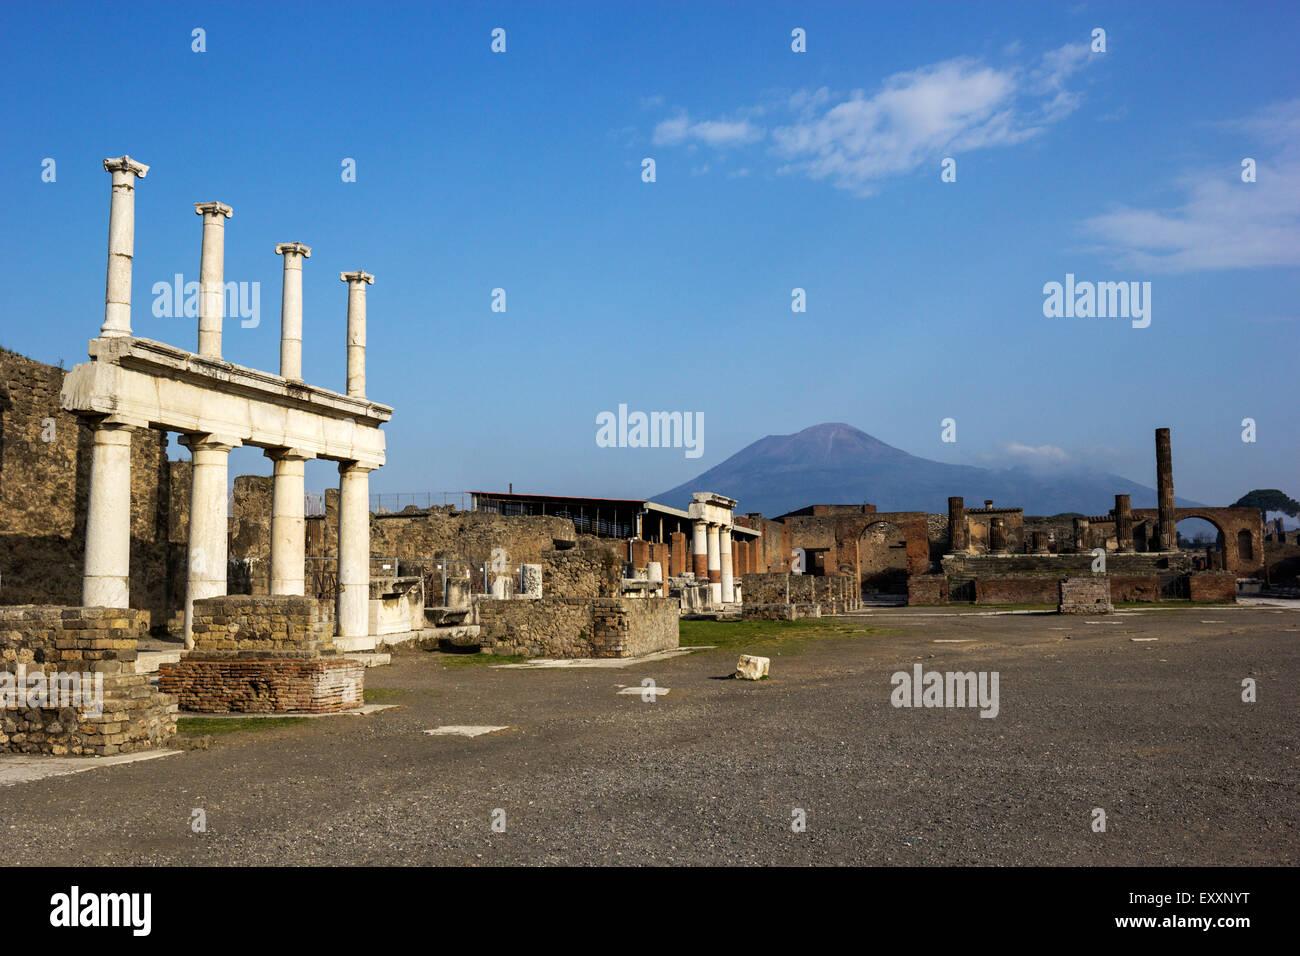 Ruins in Pompeii in Italy - Stock Image